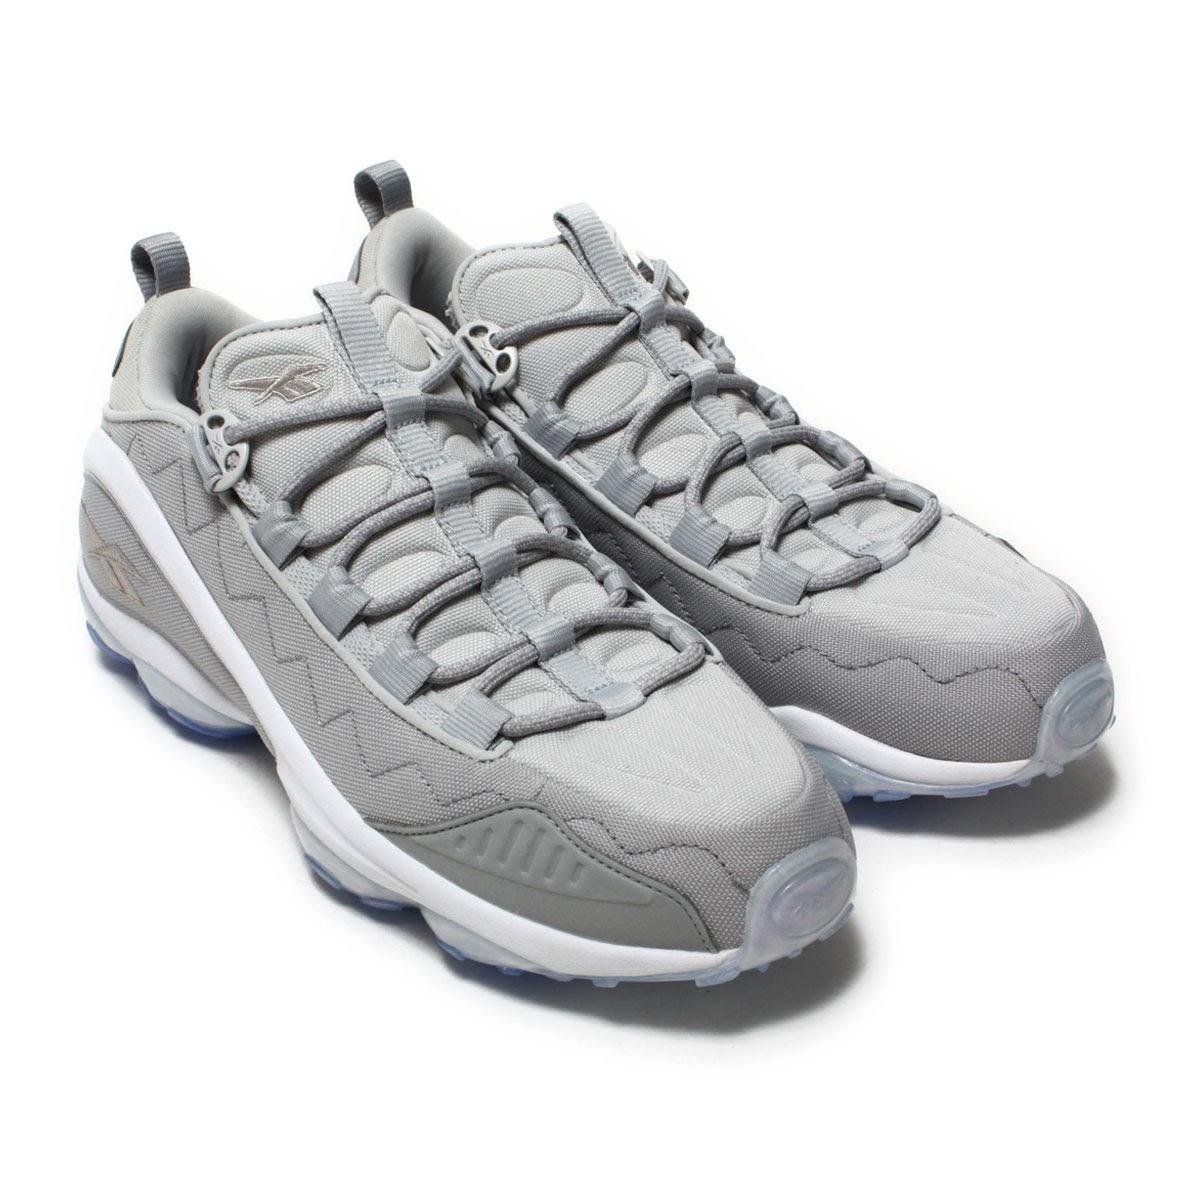 b134ed7fd37 Reebok CLASSIC (Reebok classical music) sneakers. DMX RUN 10 which appeared  in 1997